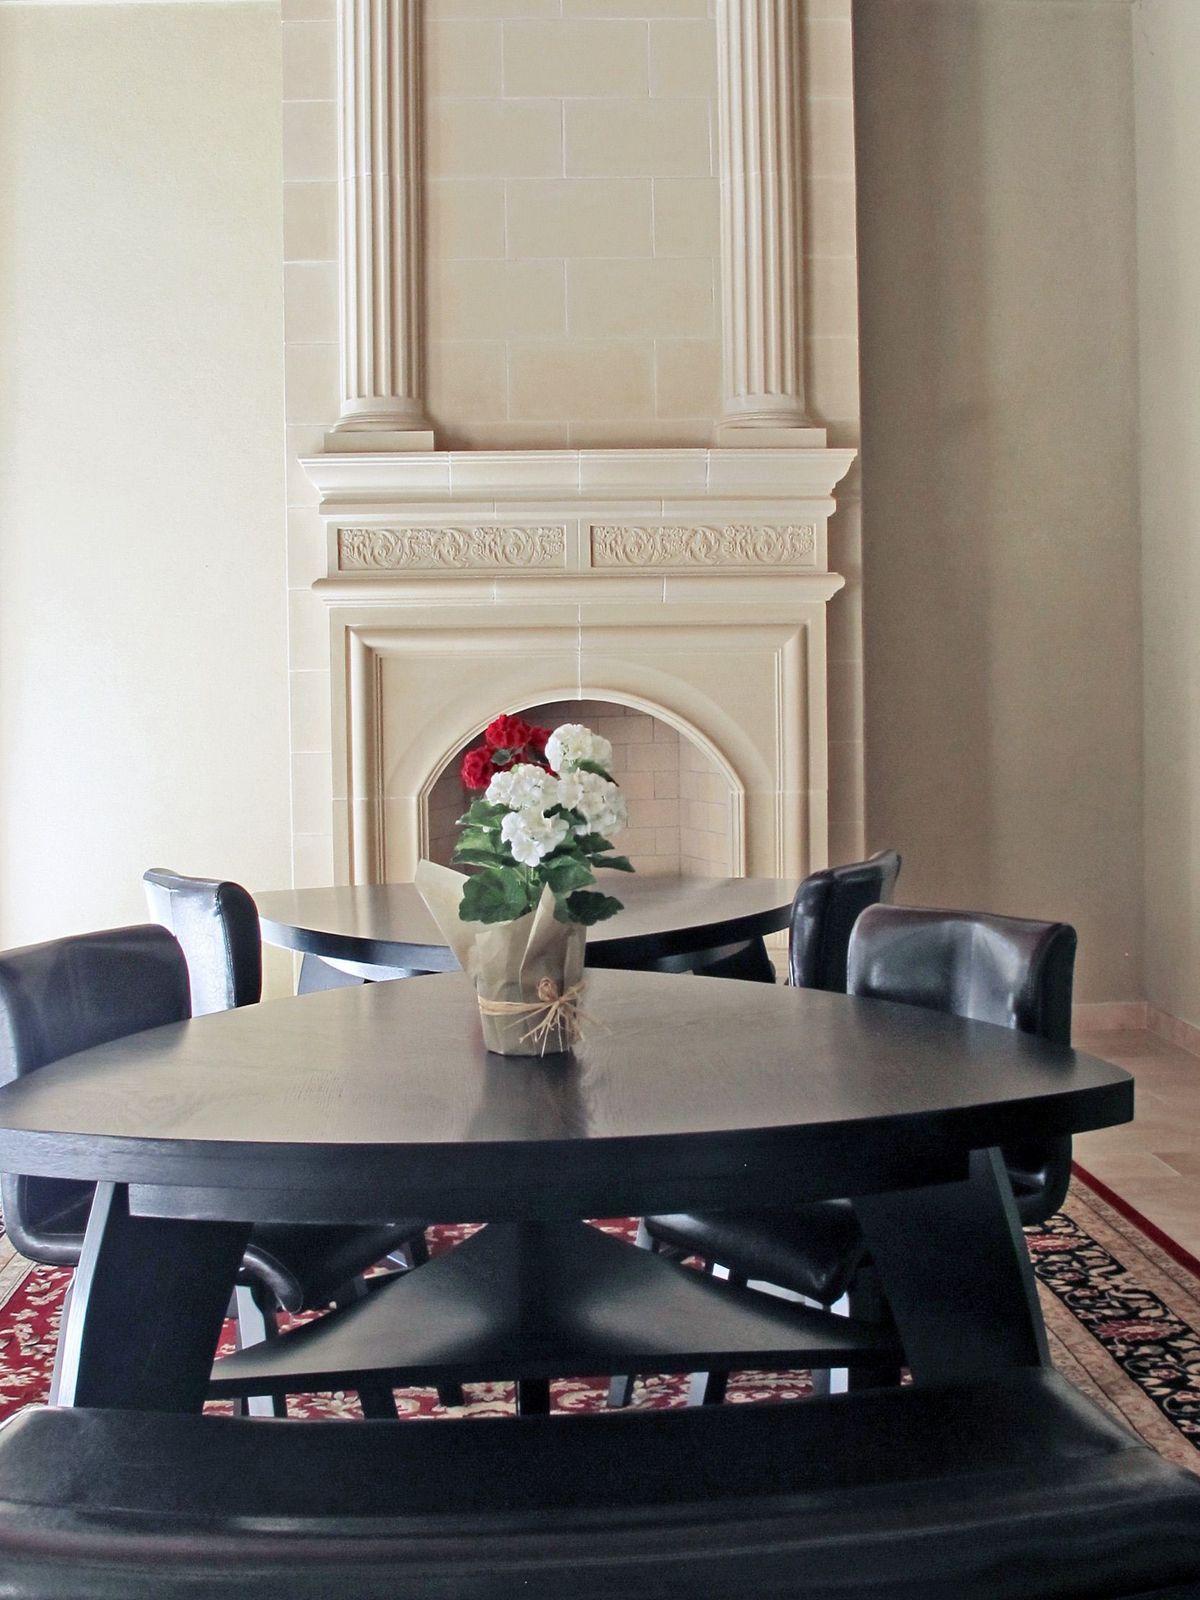 Merlo Traditional House Video Shoot Location Dallas 4.jpg